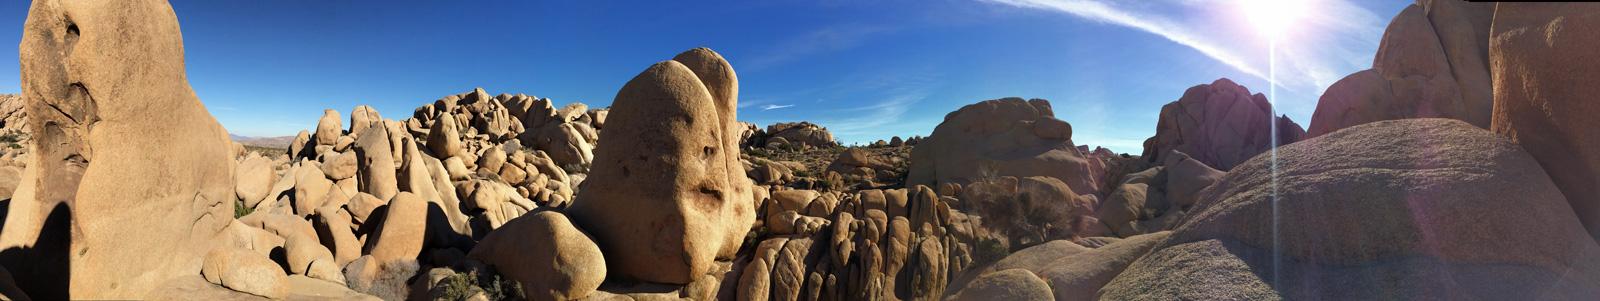 Alien landscape panorama near Jumbo Rocks.